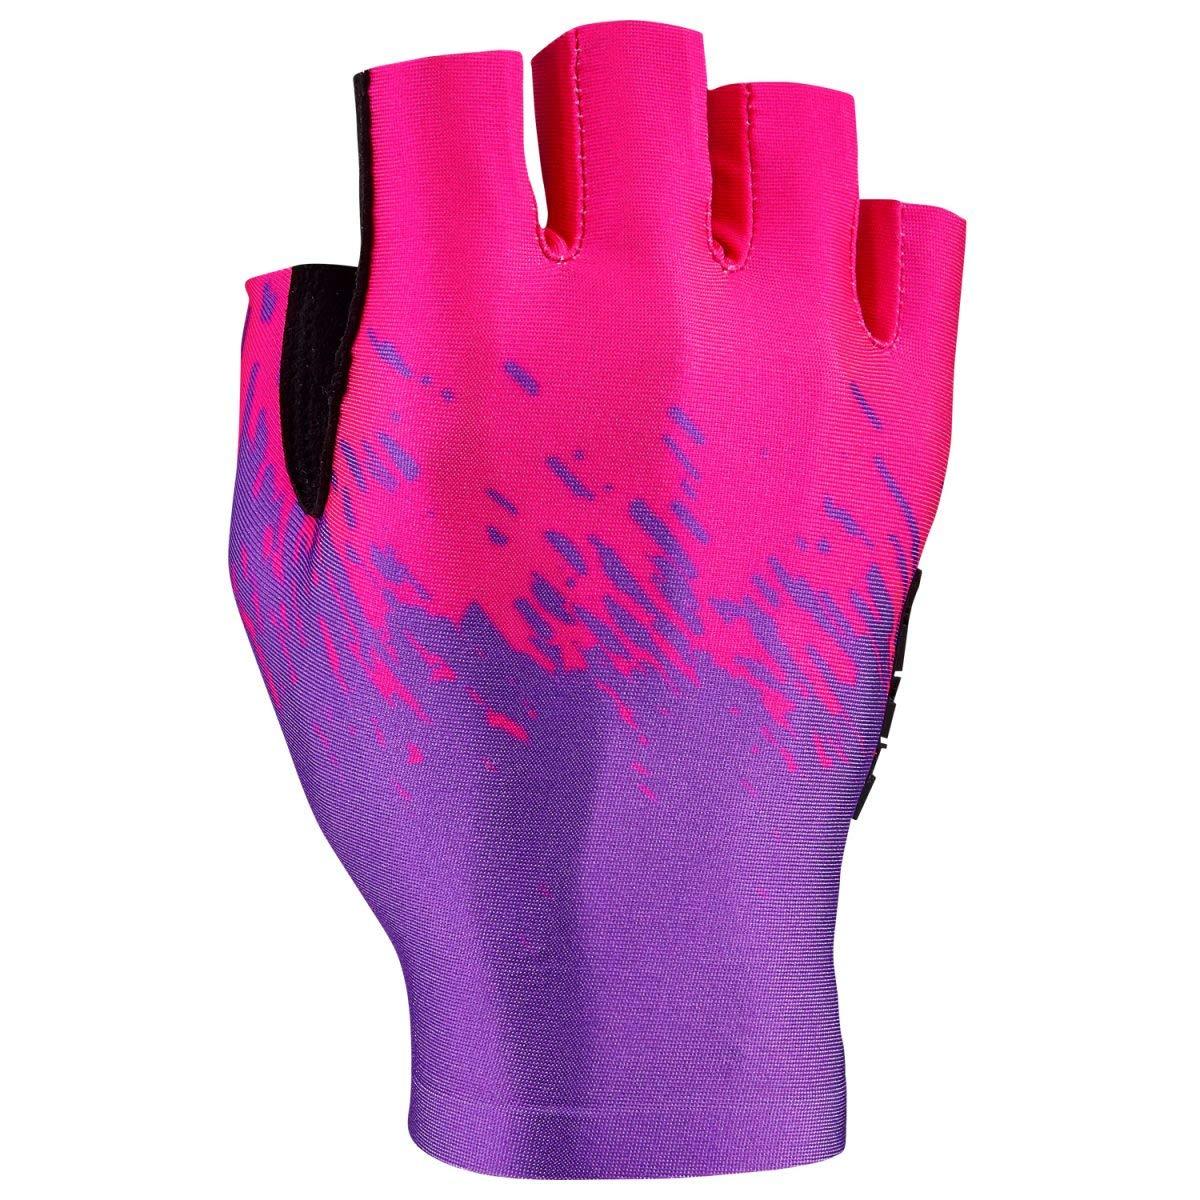 Supacaz SupaG Short Finger Cycling Gloves